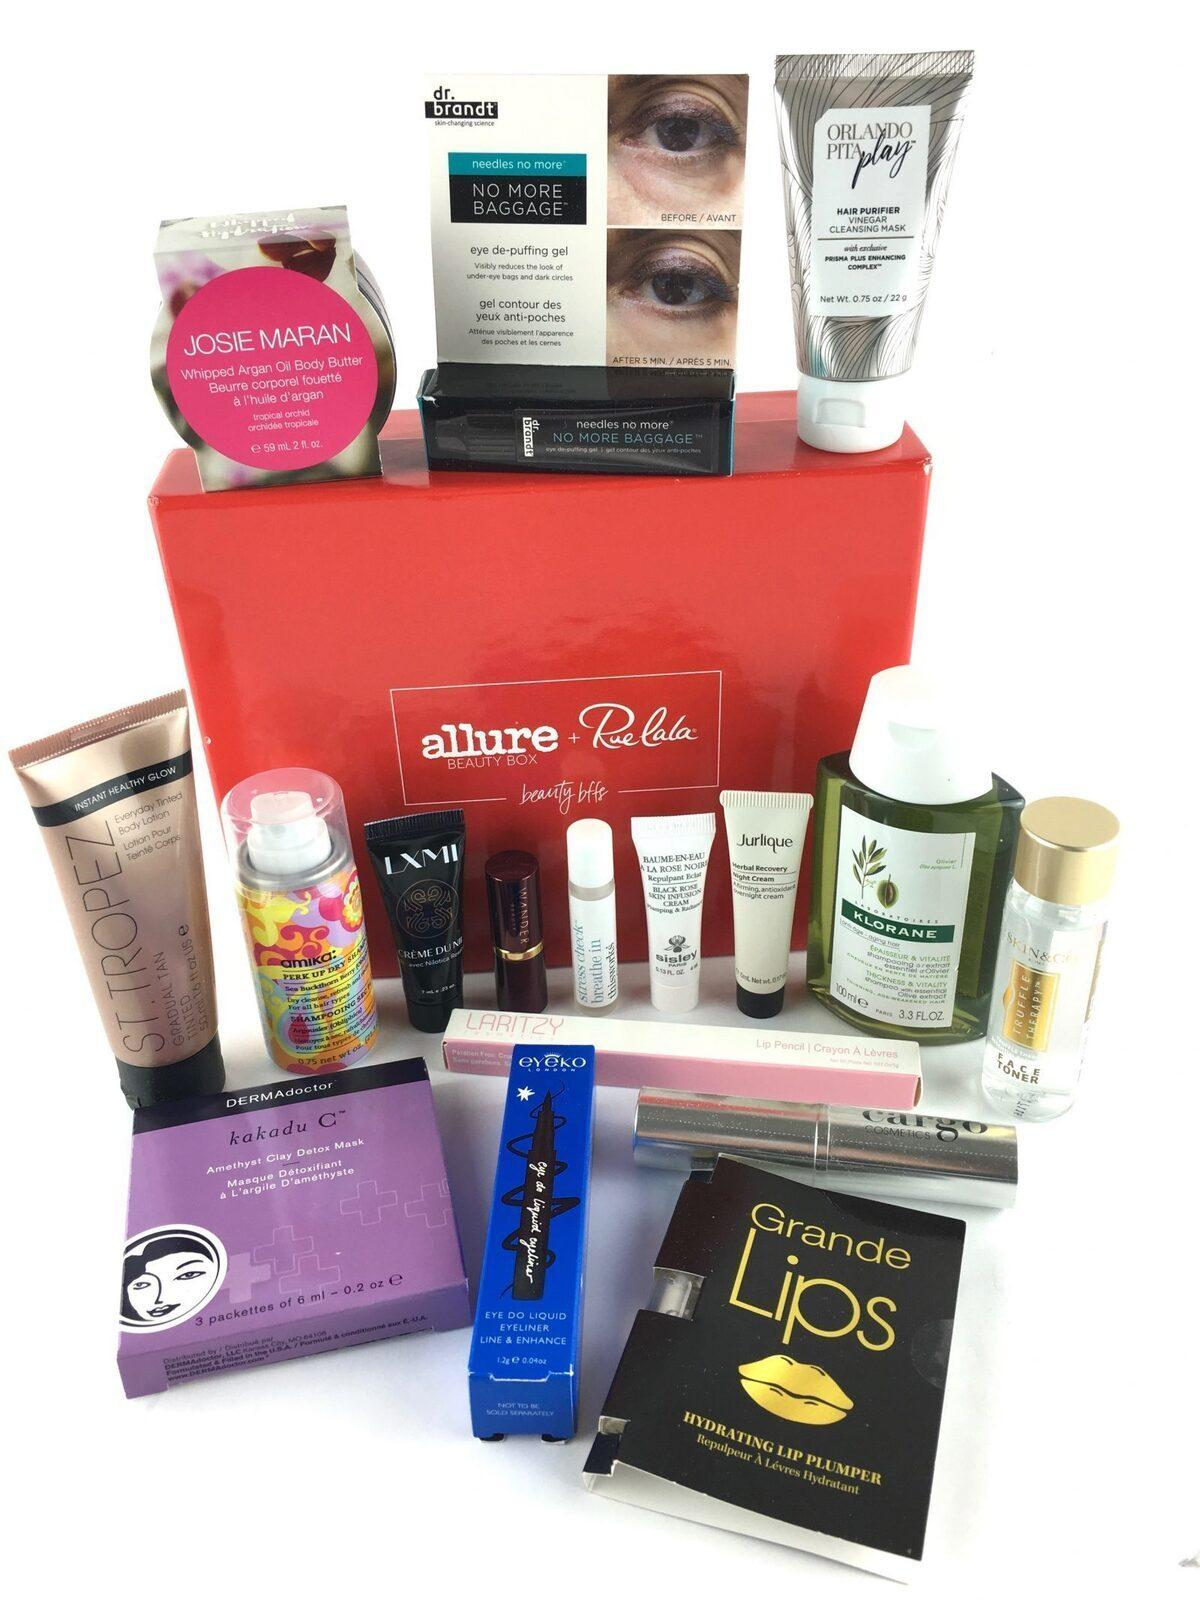 Allure Beauty Box x RueLaLa Box Giveaway (CLOSED)